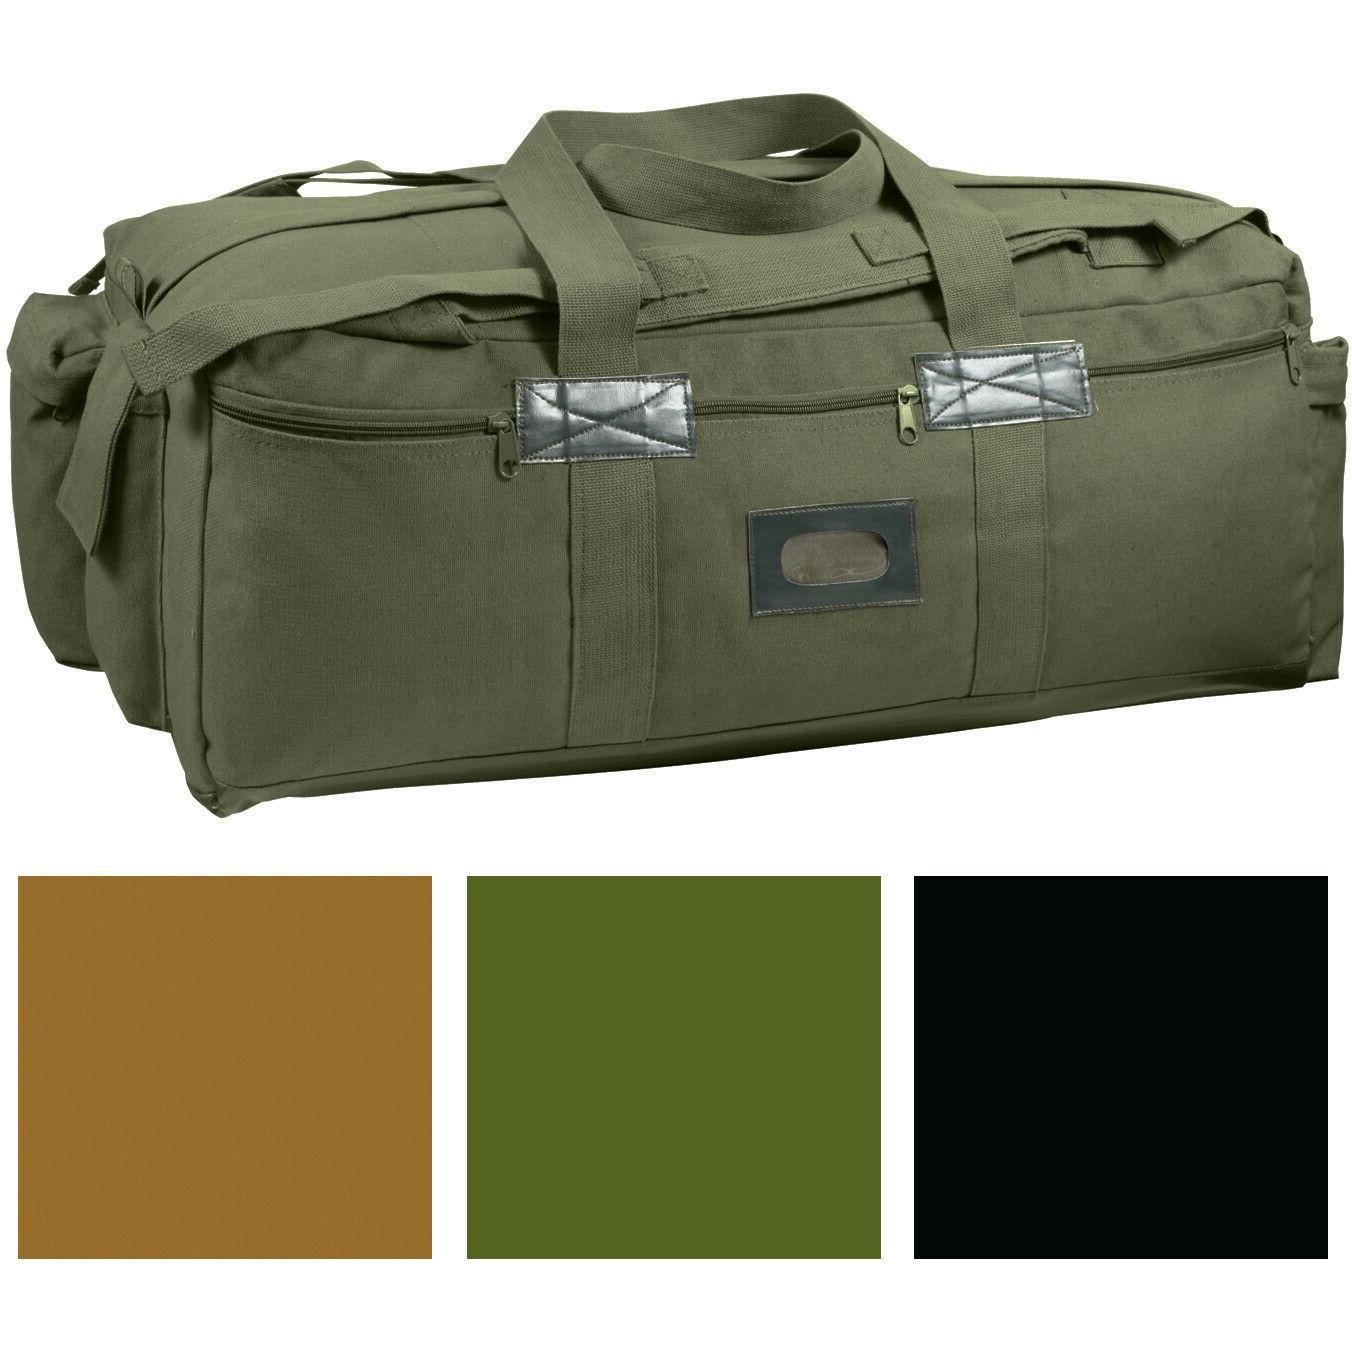 heavy duty cotton canvas tactical duffle bag